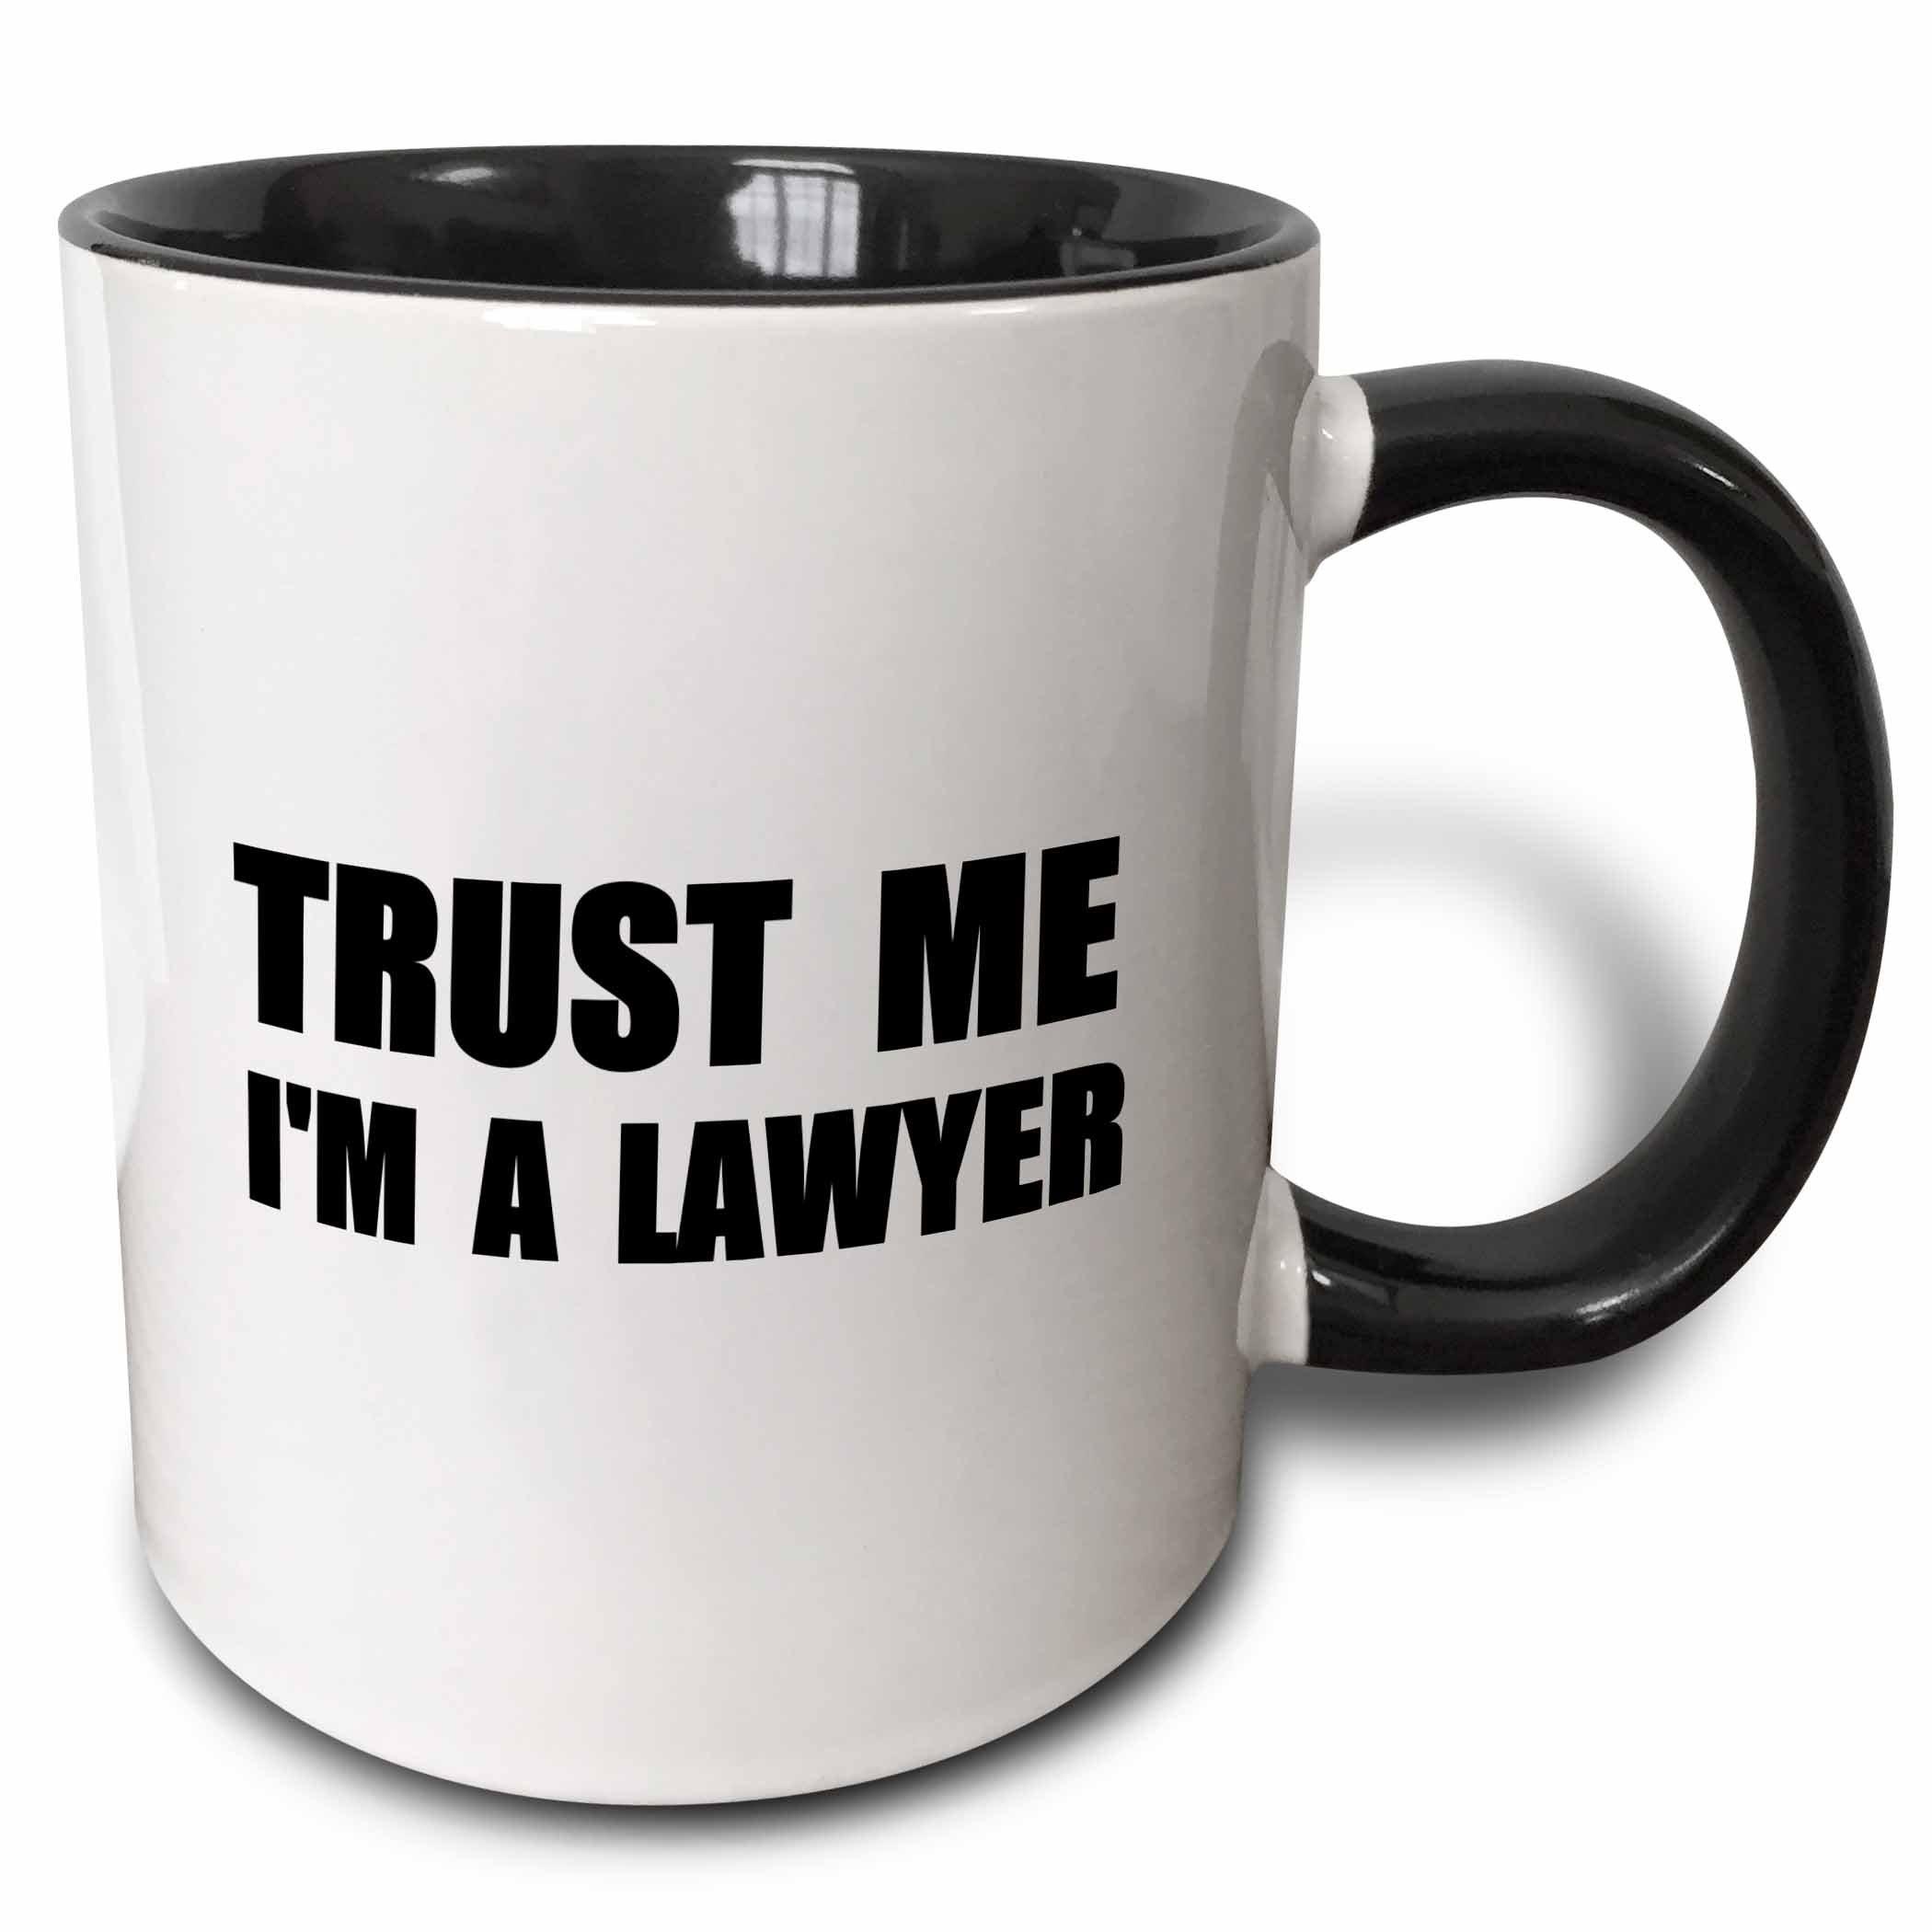 3dRose Trust Me I'M A Lawyer - Fun Law Humor - Funny Job Work Office Gift Mug, 11 oz, Black